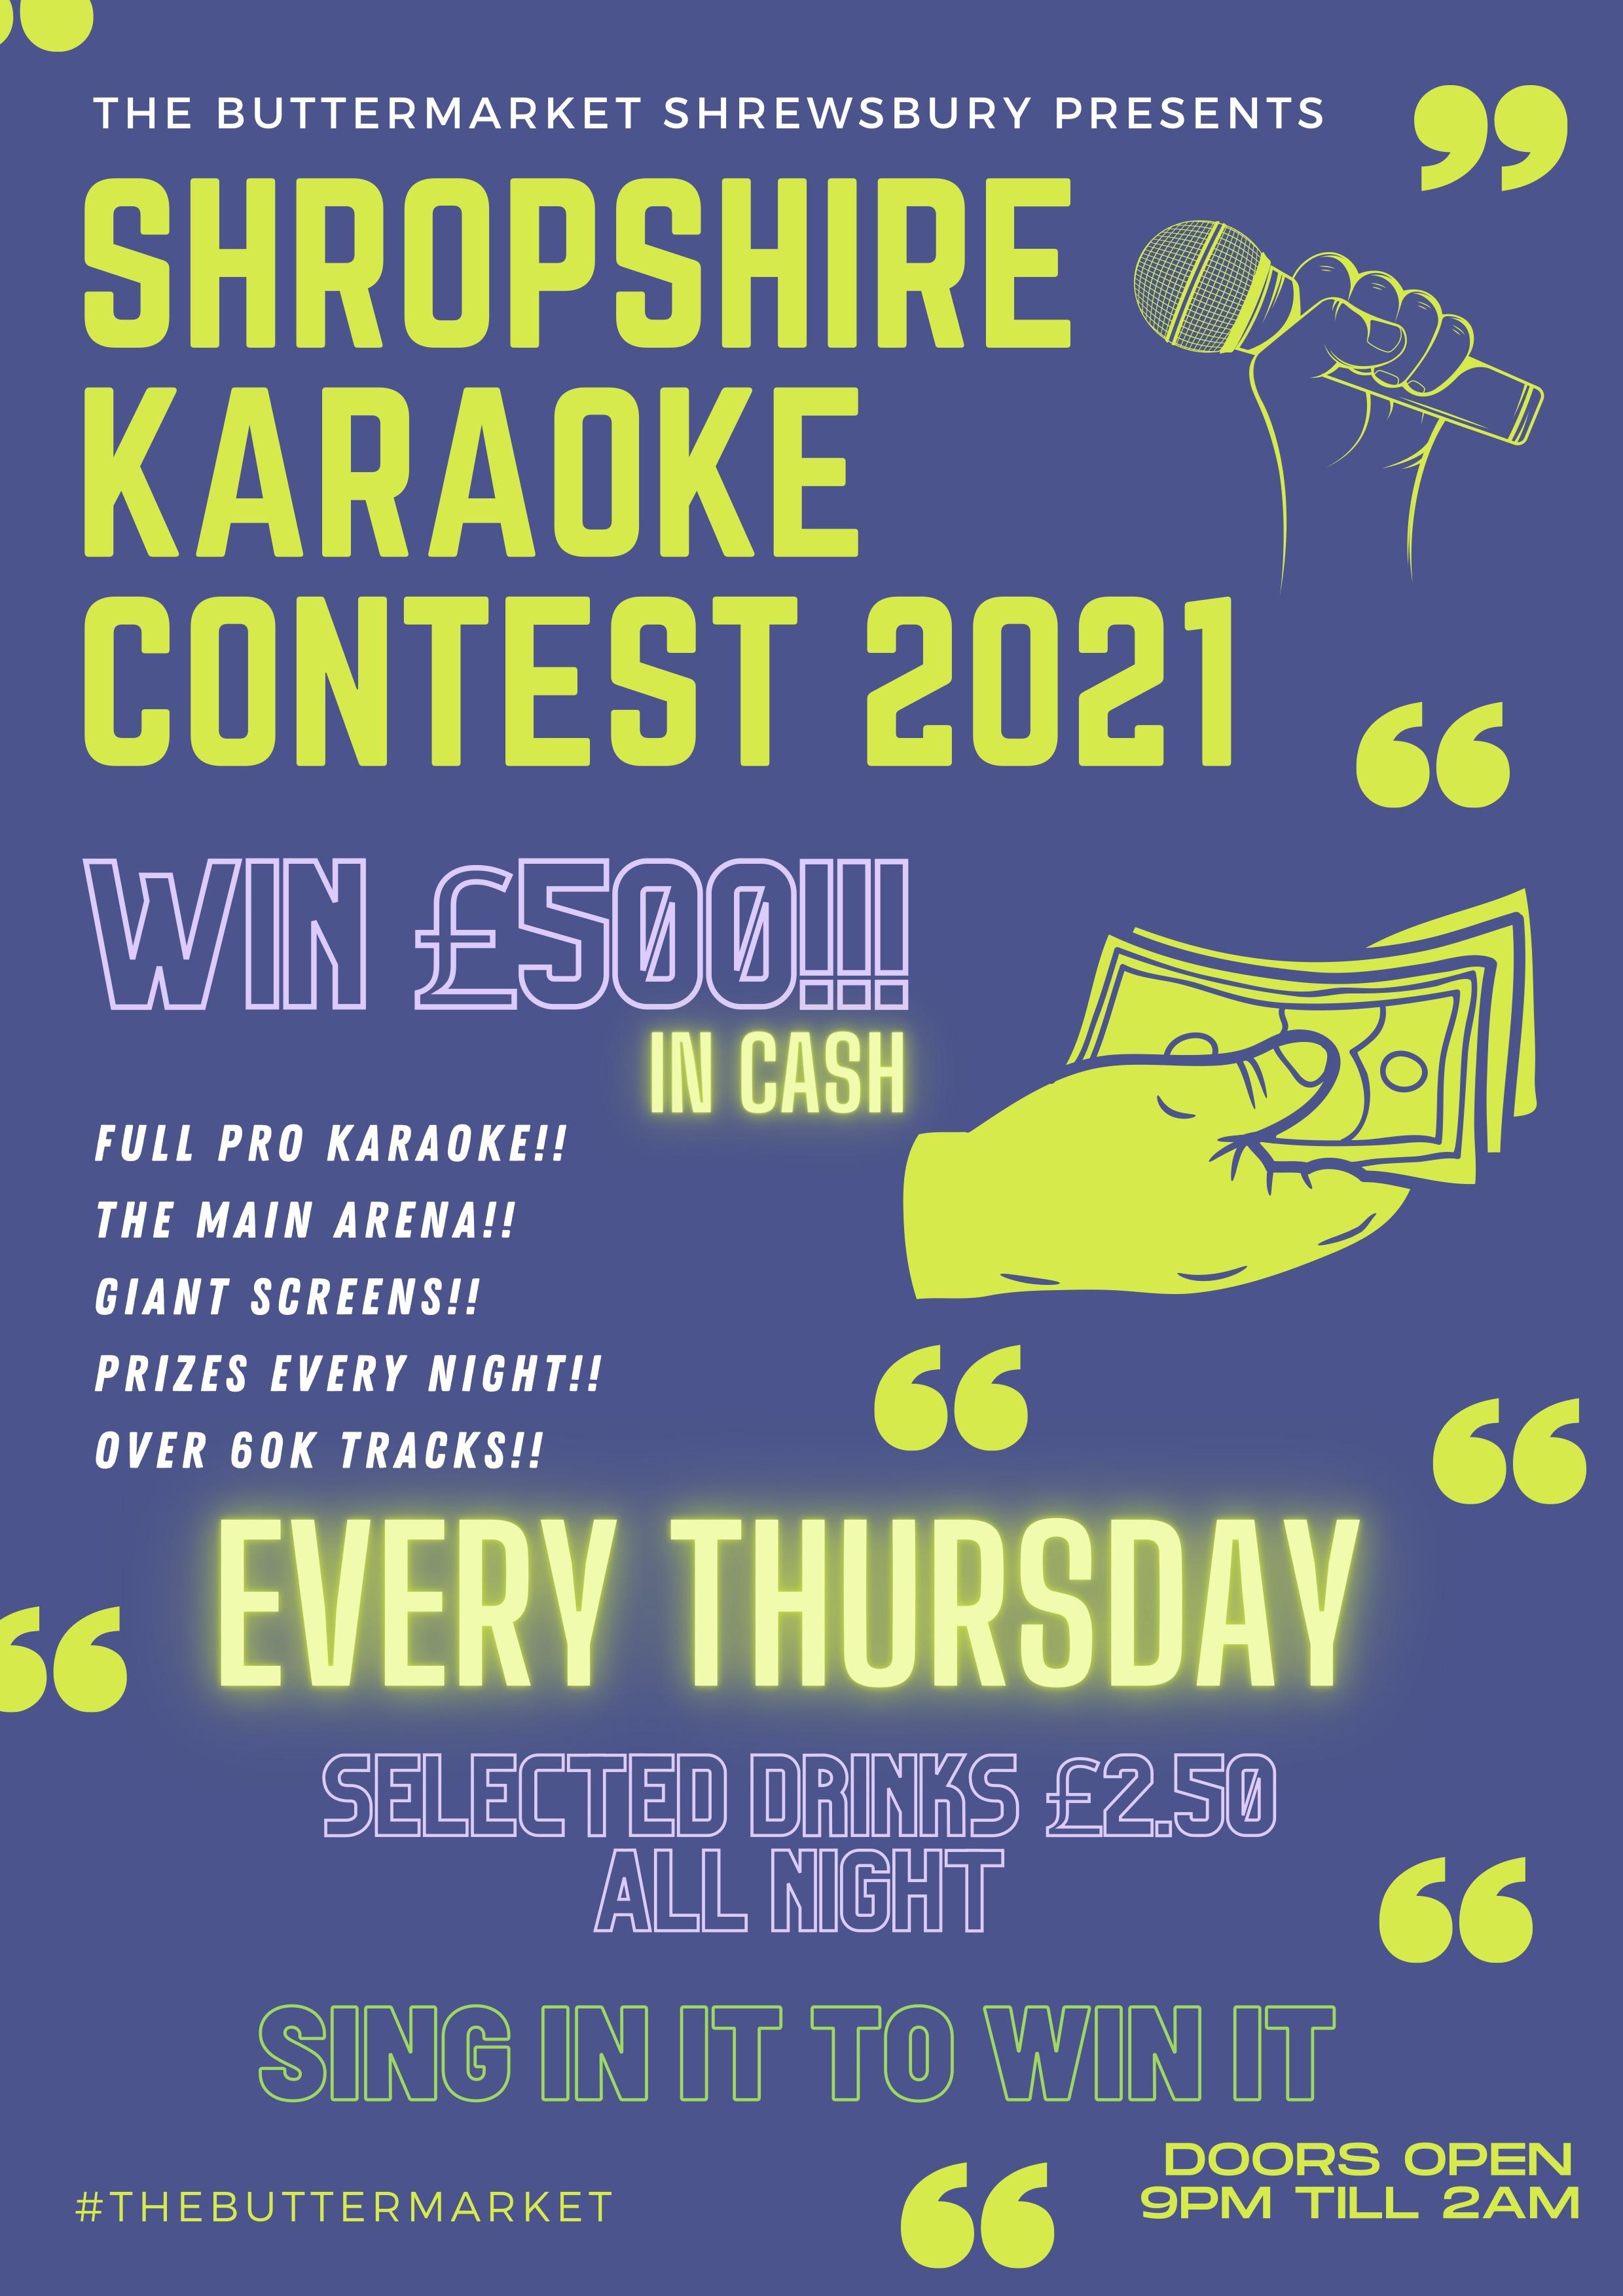 Shropshire Karaoke Contest 2021 – FREE TICKETS!